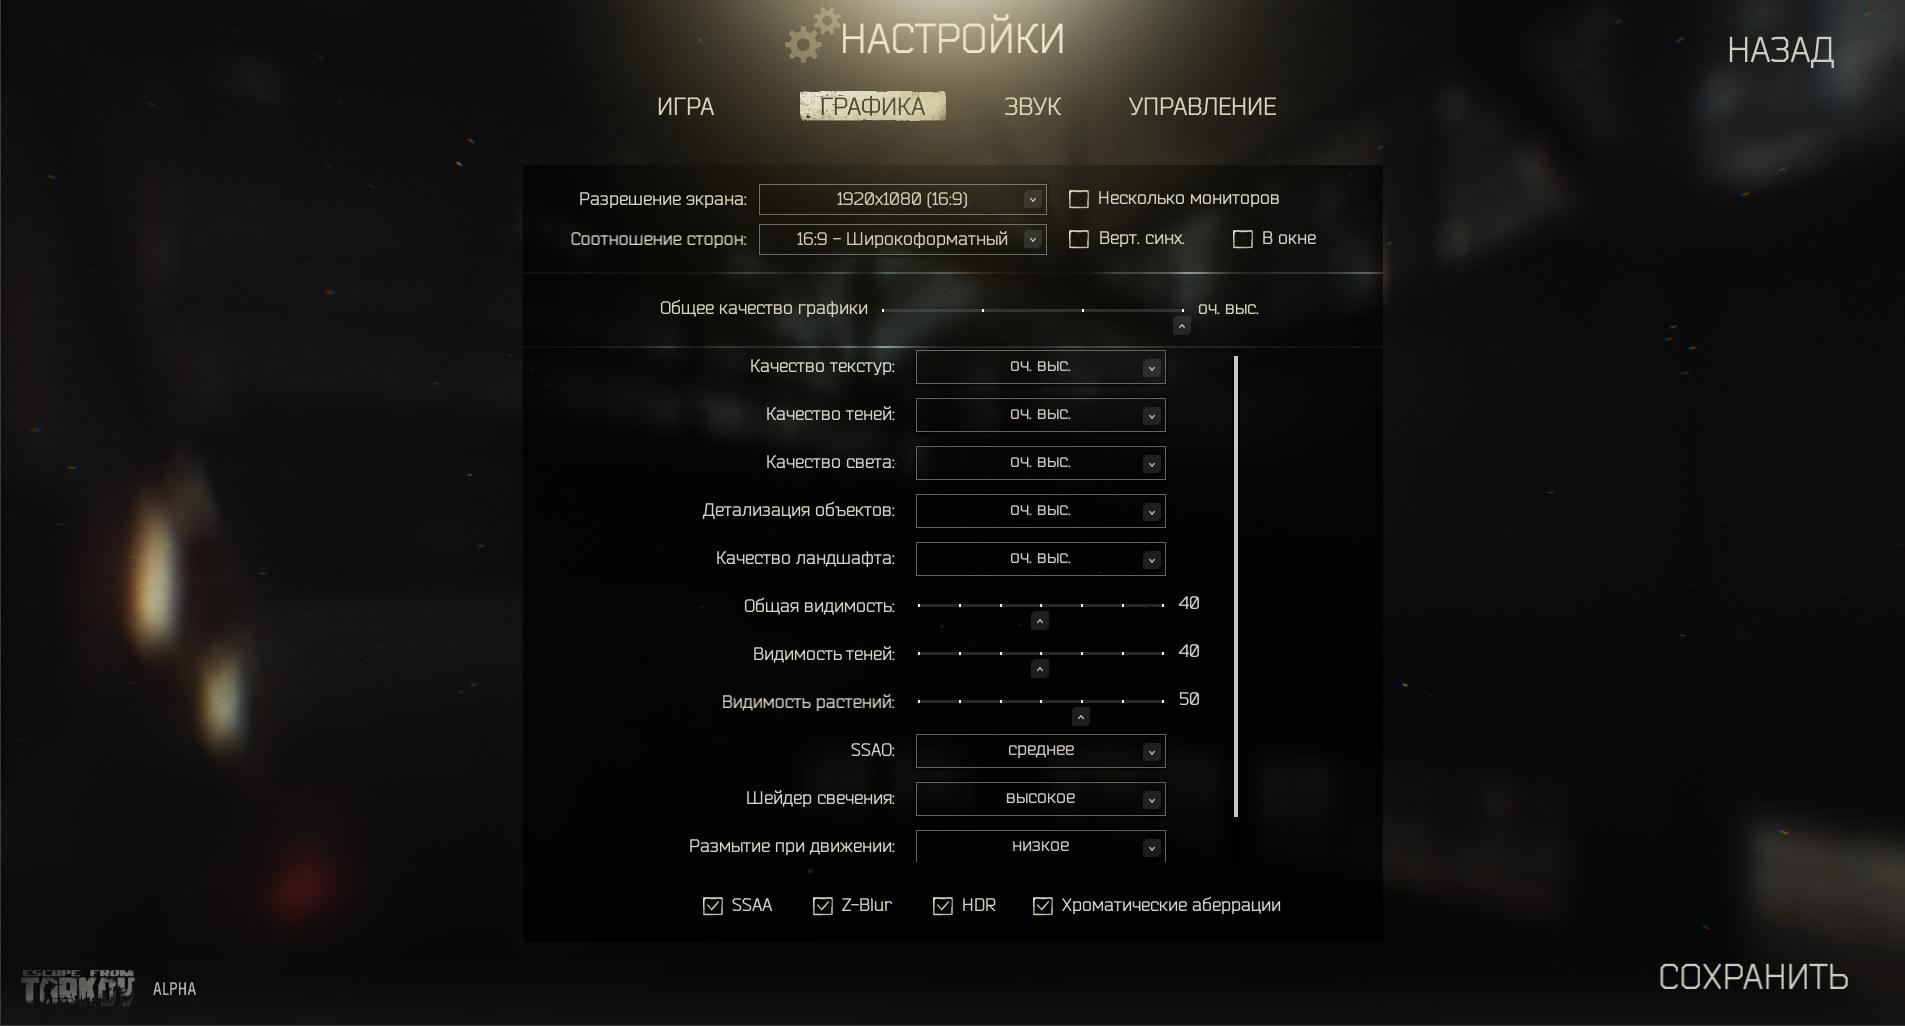 eft_alpha_interface_settings_graphics_rus